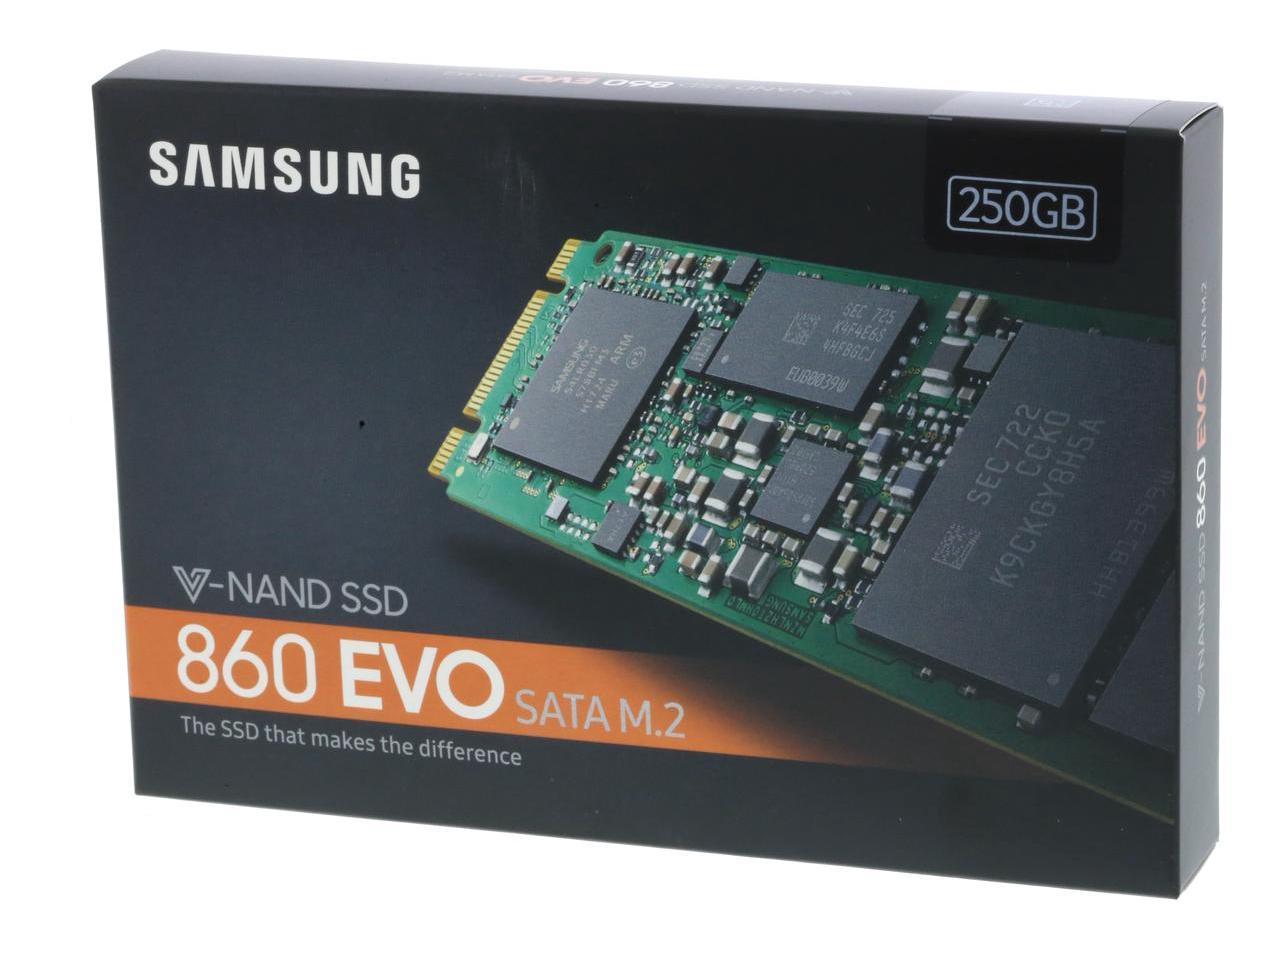 SAMSUNG SSD 860 EVO Series M.2 2280 250GB 250G SATA III 3D NAND Internal